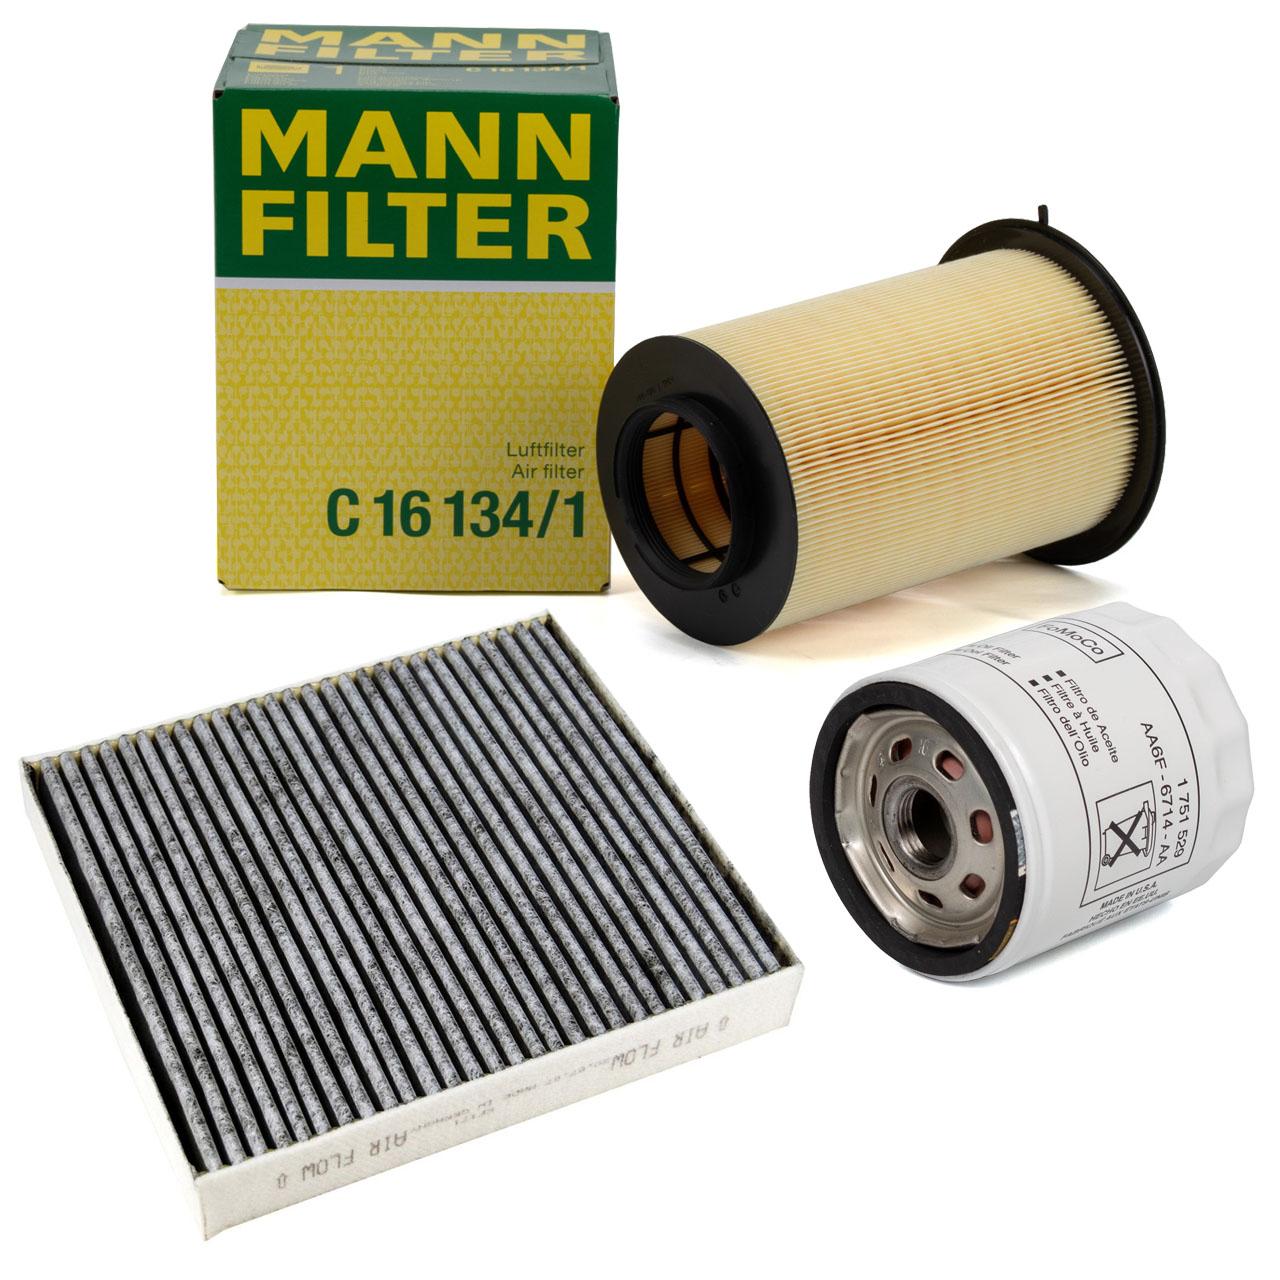 Inspektionskit FORD C-Max DM2 1.8 / Flexifuel + 2.0 / LPG / CNG 122-145 PS